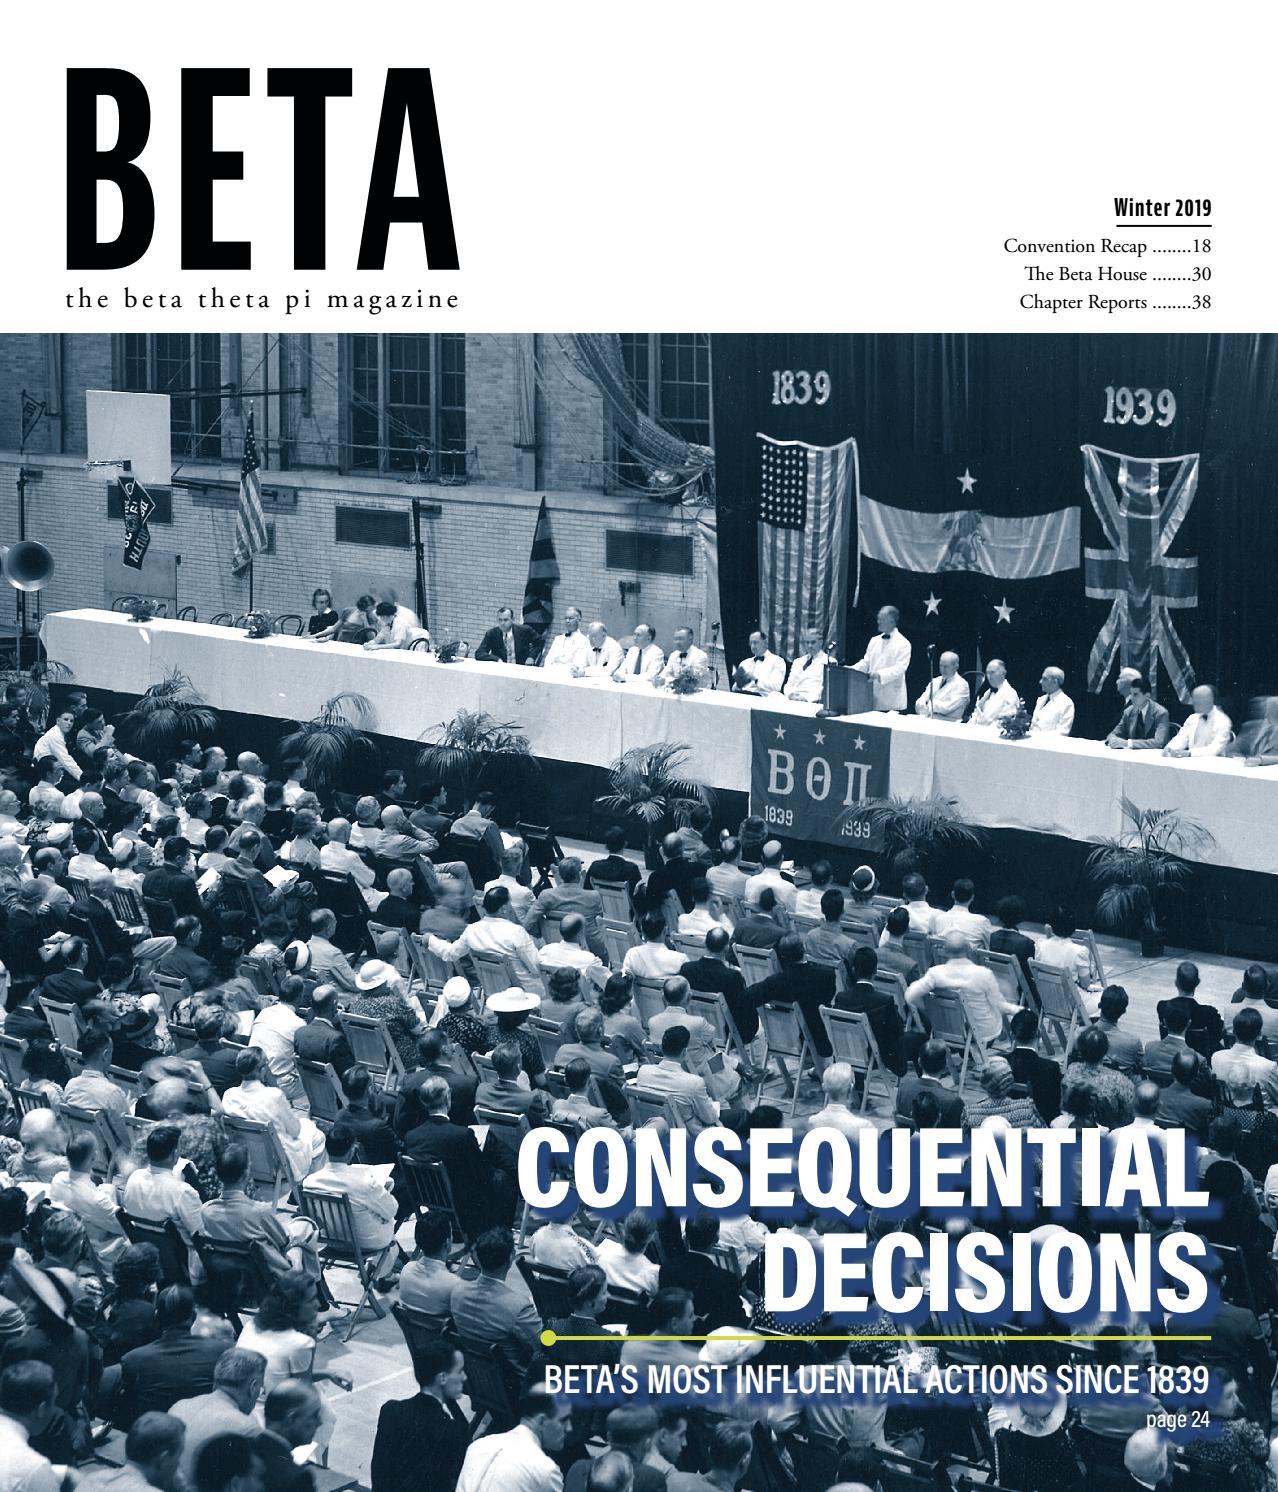 12ad509444d6 The Beta Theta Pi - Winter 2019 by Beta Theta Pi - issuu